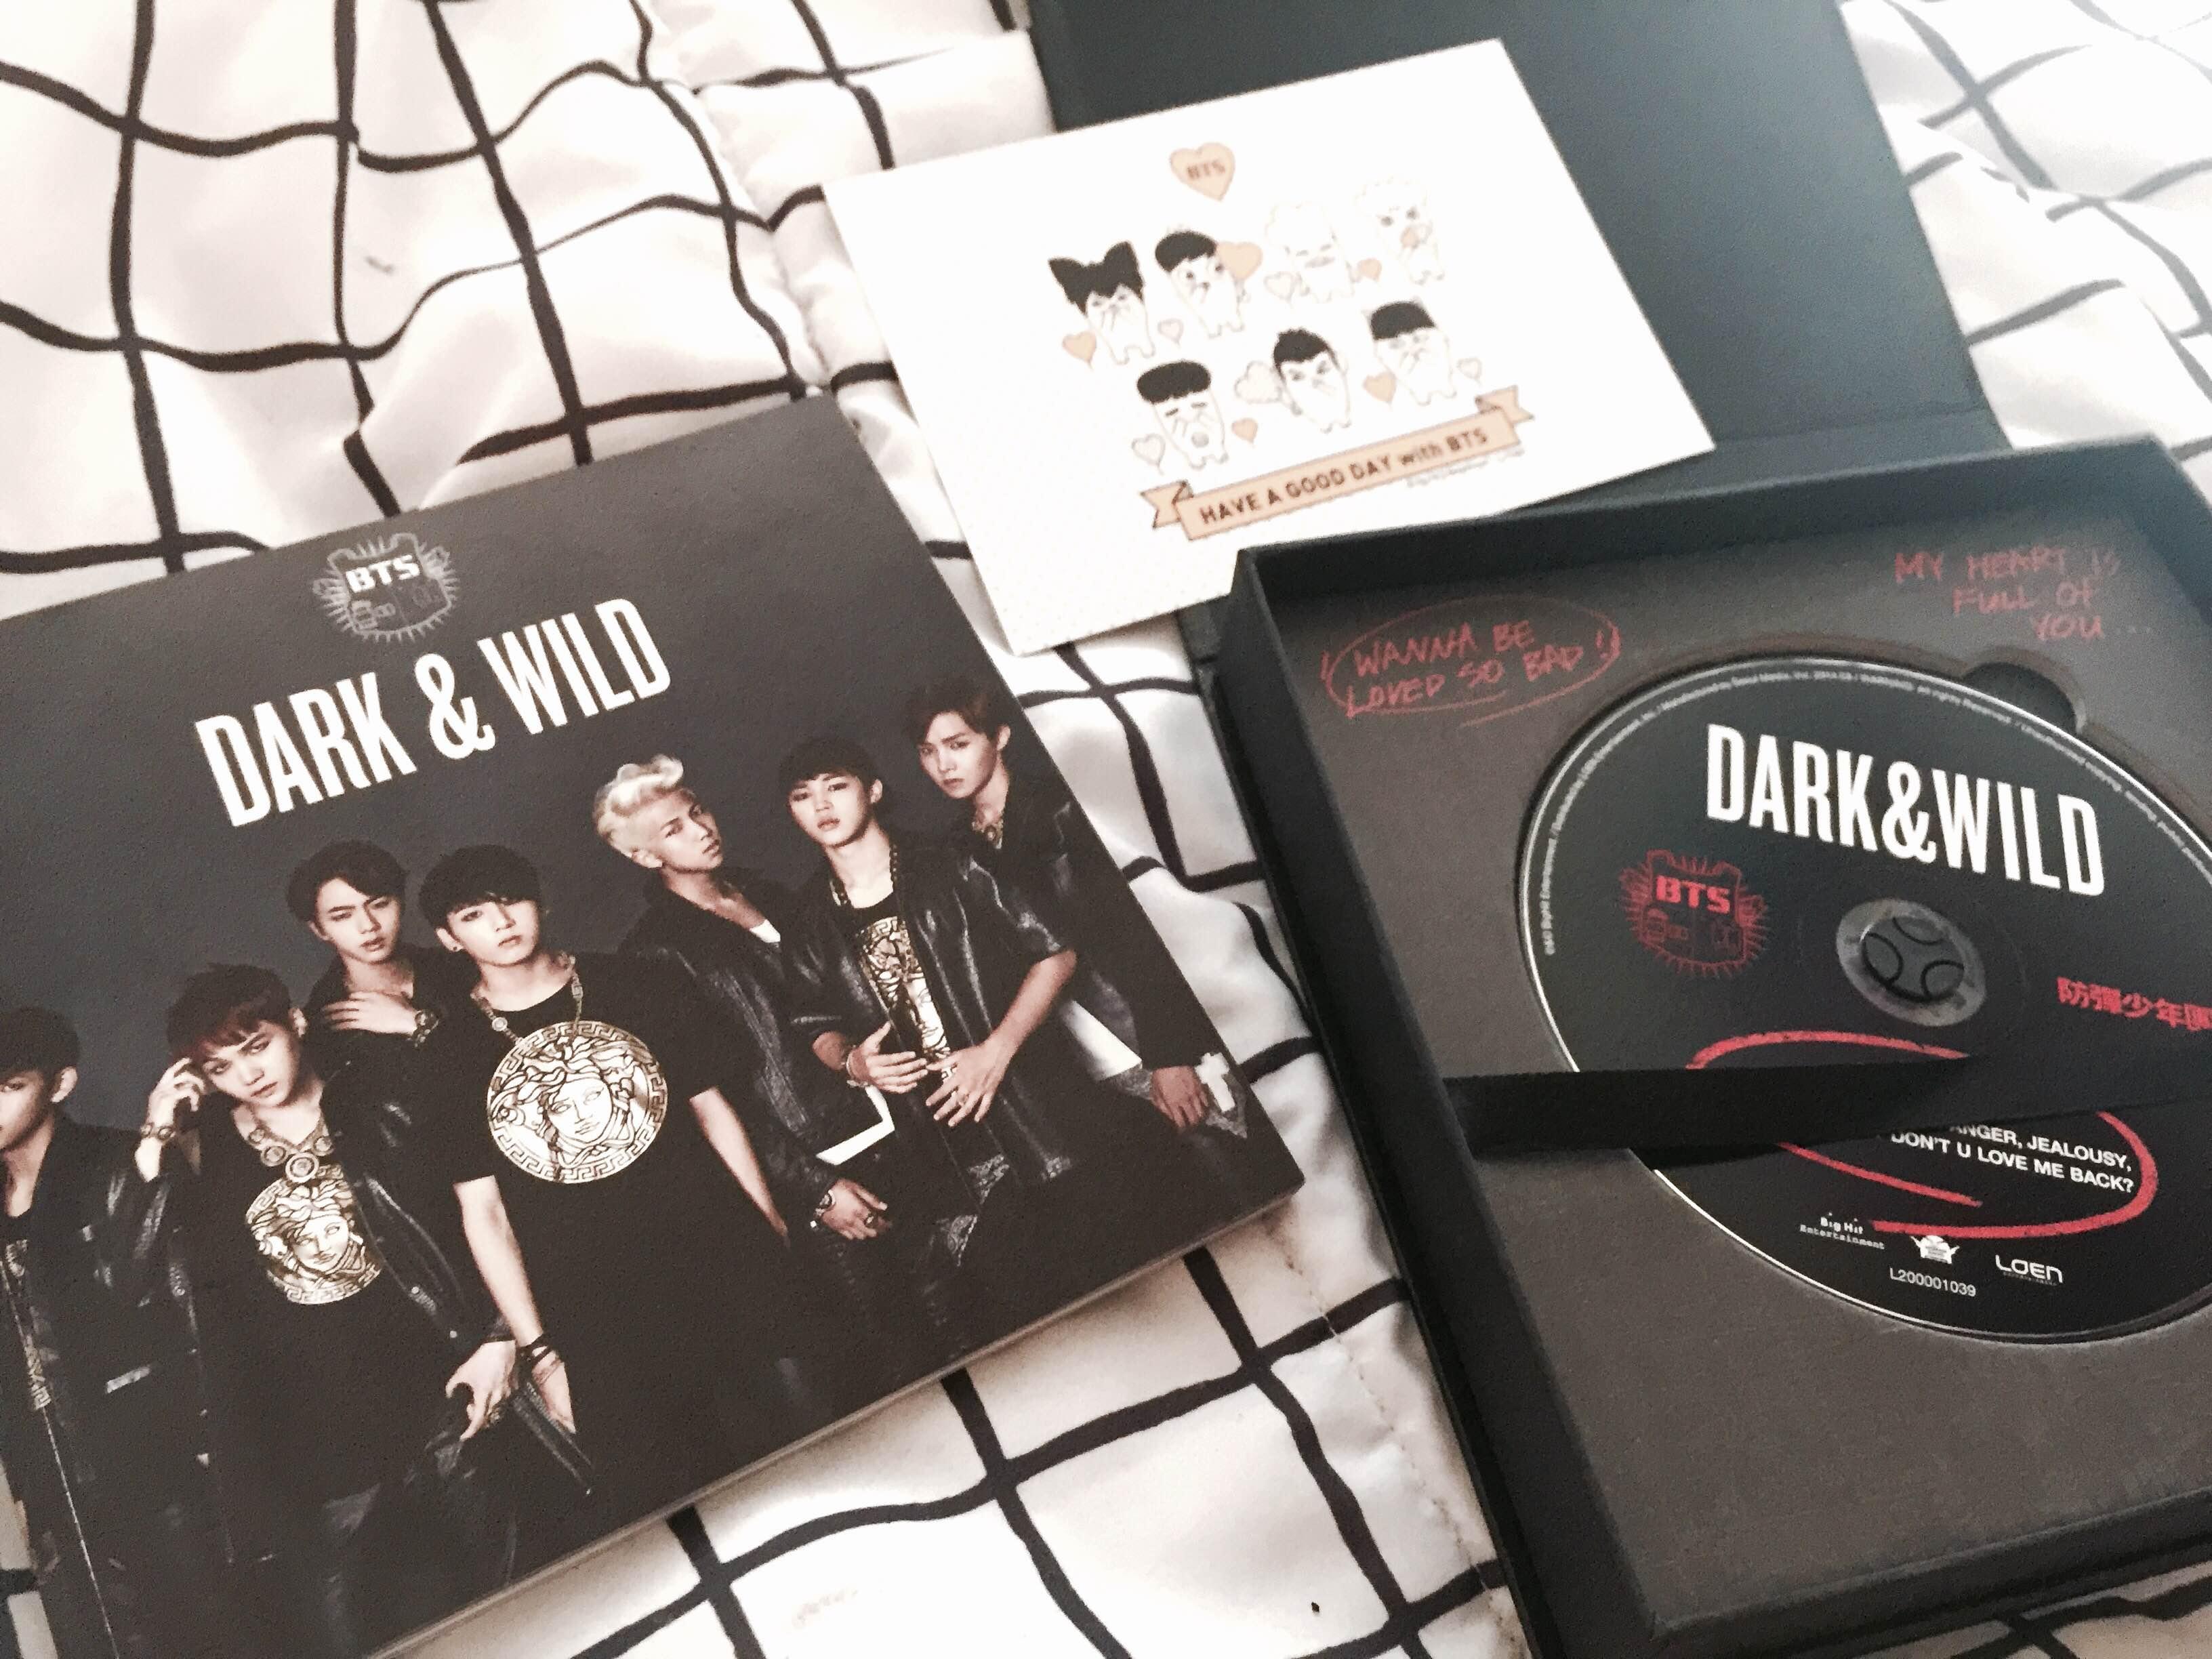 dark & wild bangtan boys kpop album sold by sky above, voice within